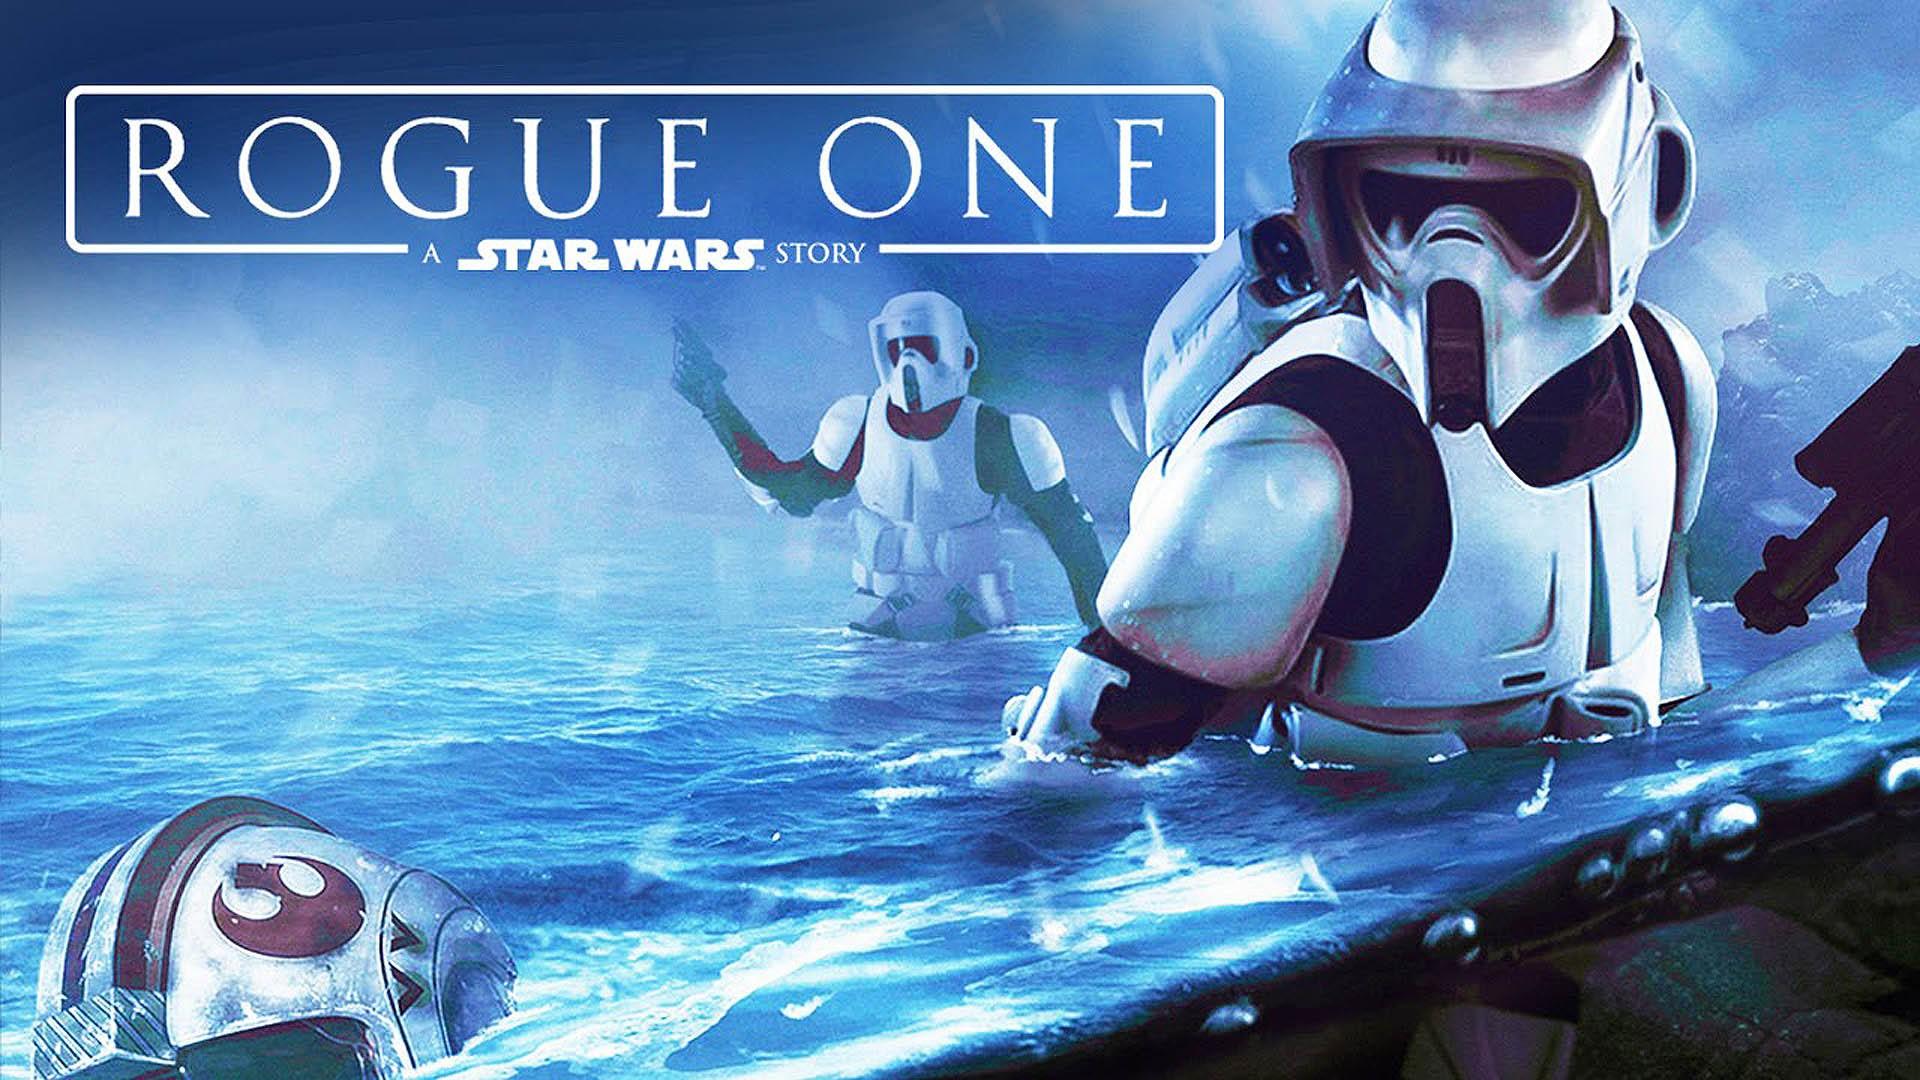 Star Wars Rogue One Wallpaper: Star Wars Rogue One Wallpaper ·① Download Free High